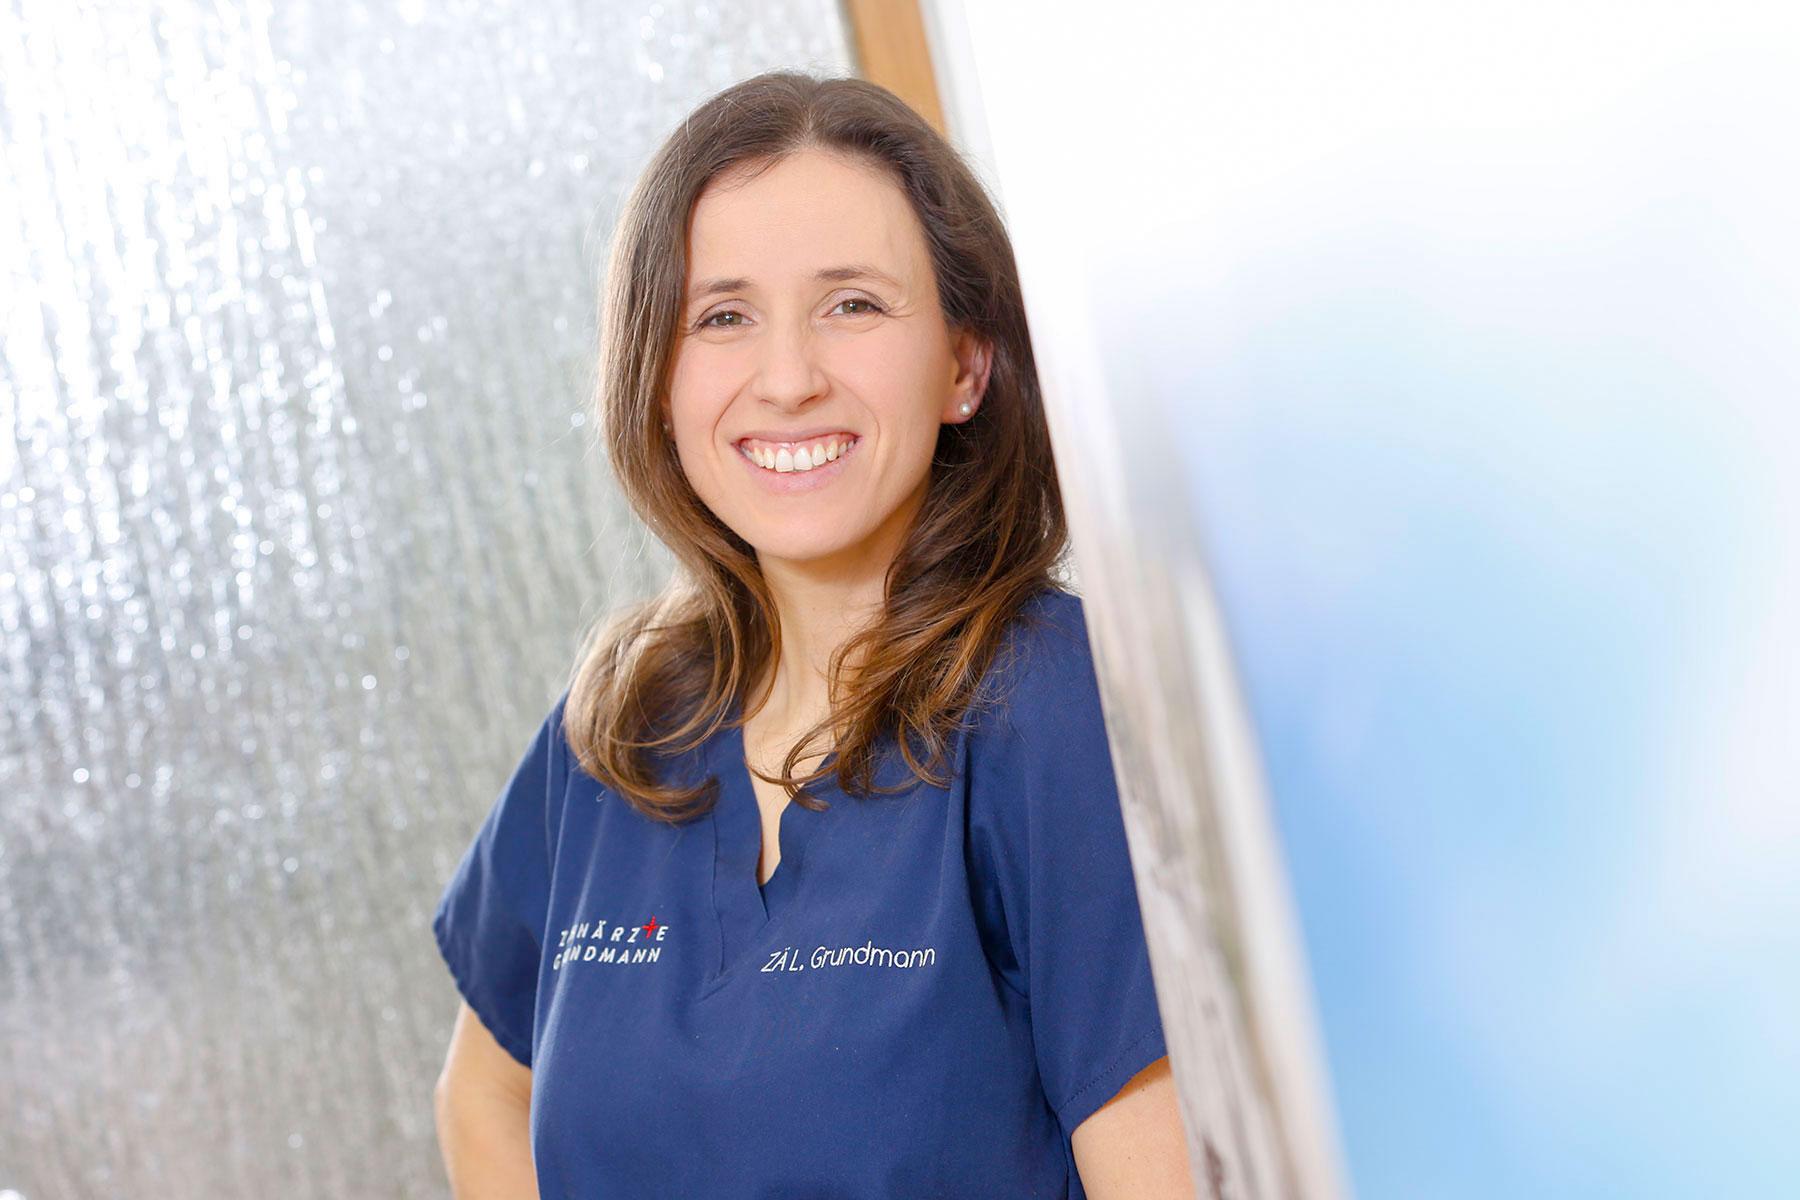 Zahnarztpraxis Grundmann - Zahnärztin Grundmann